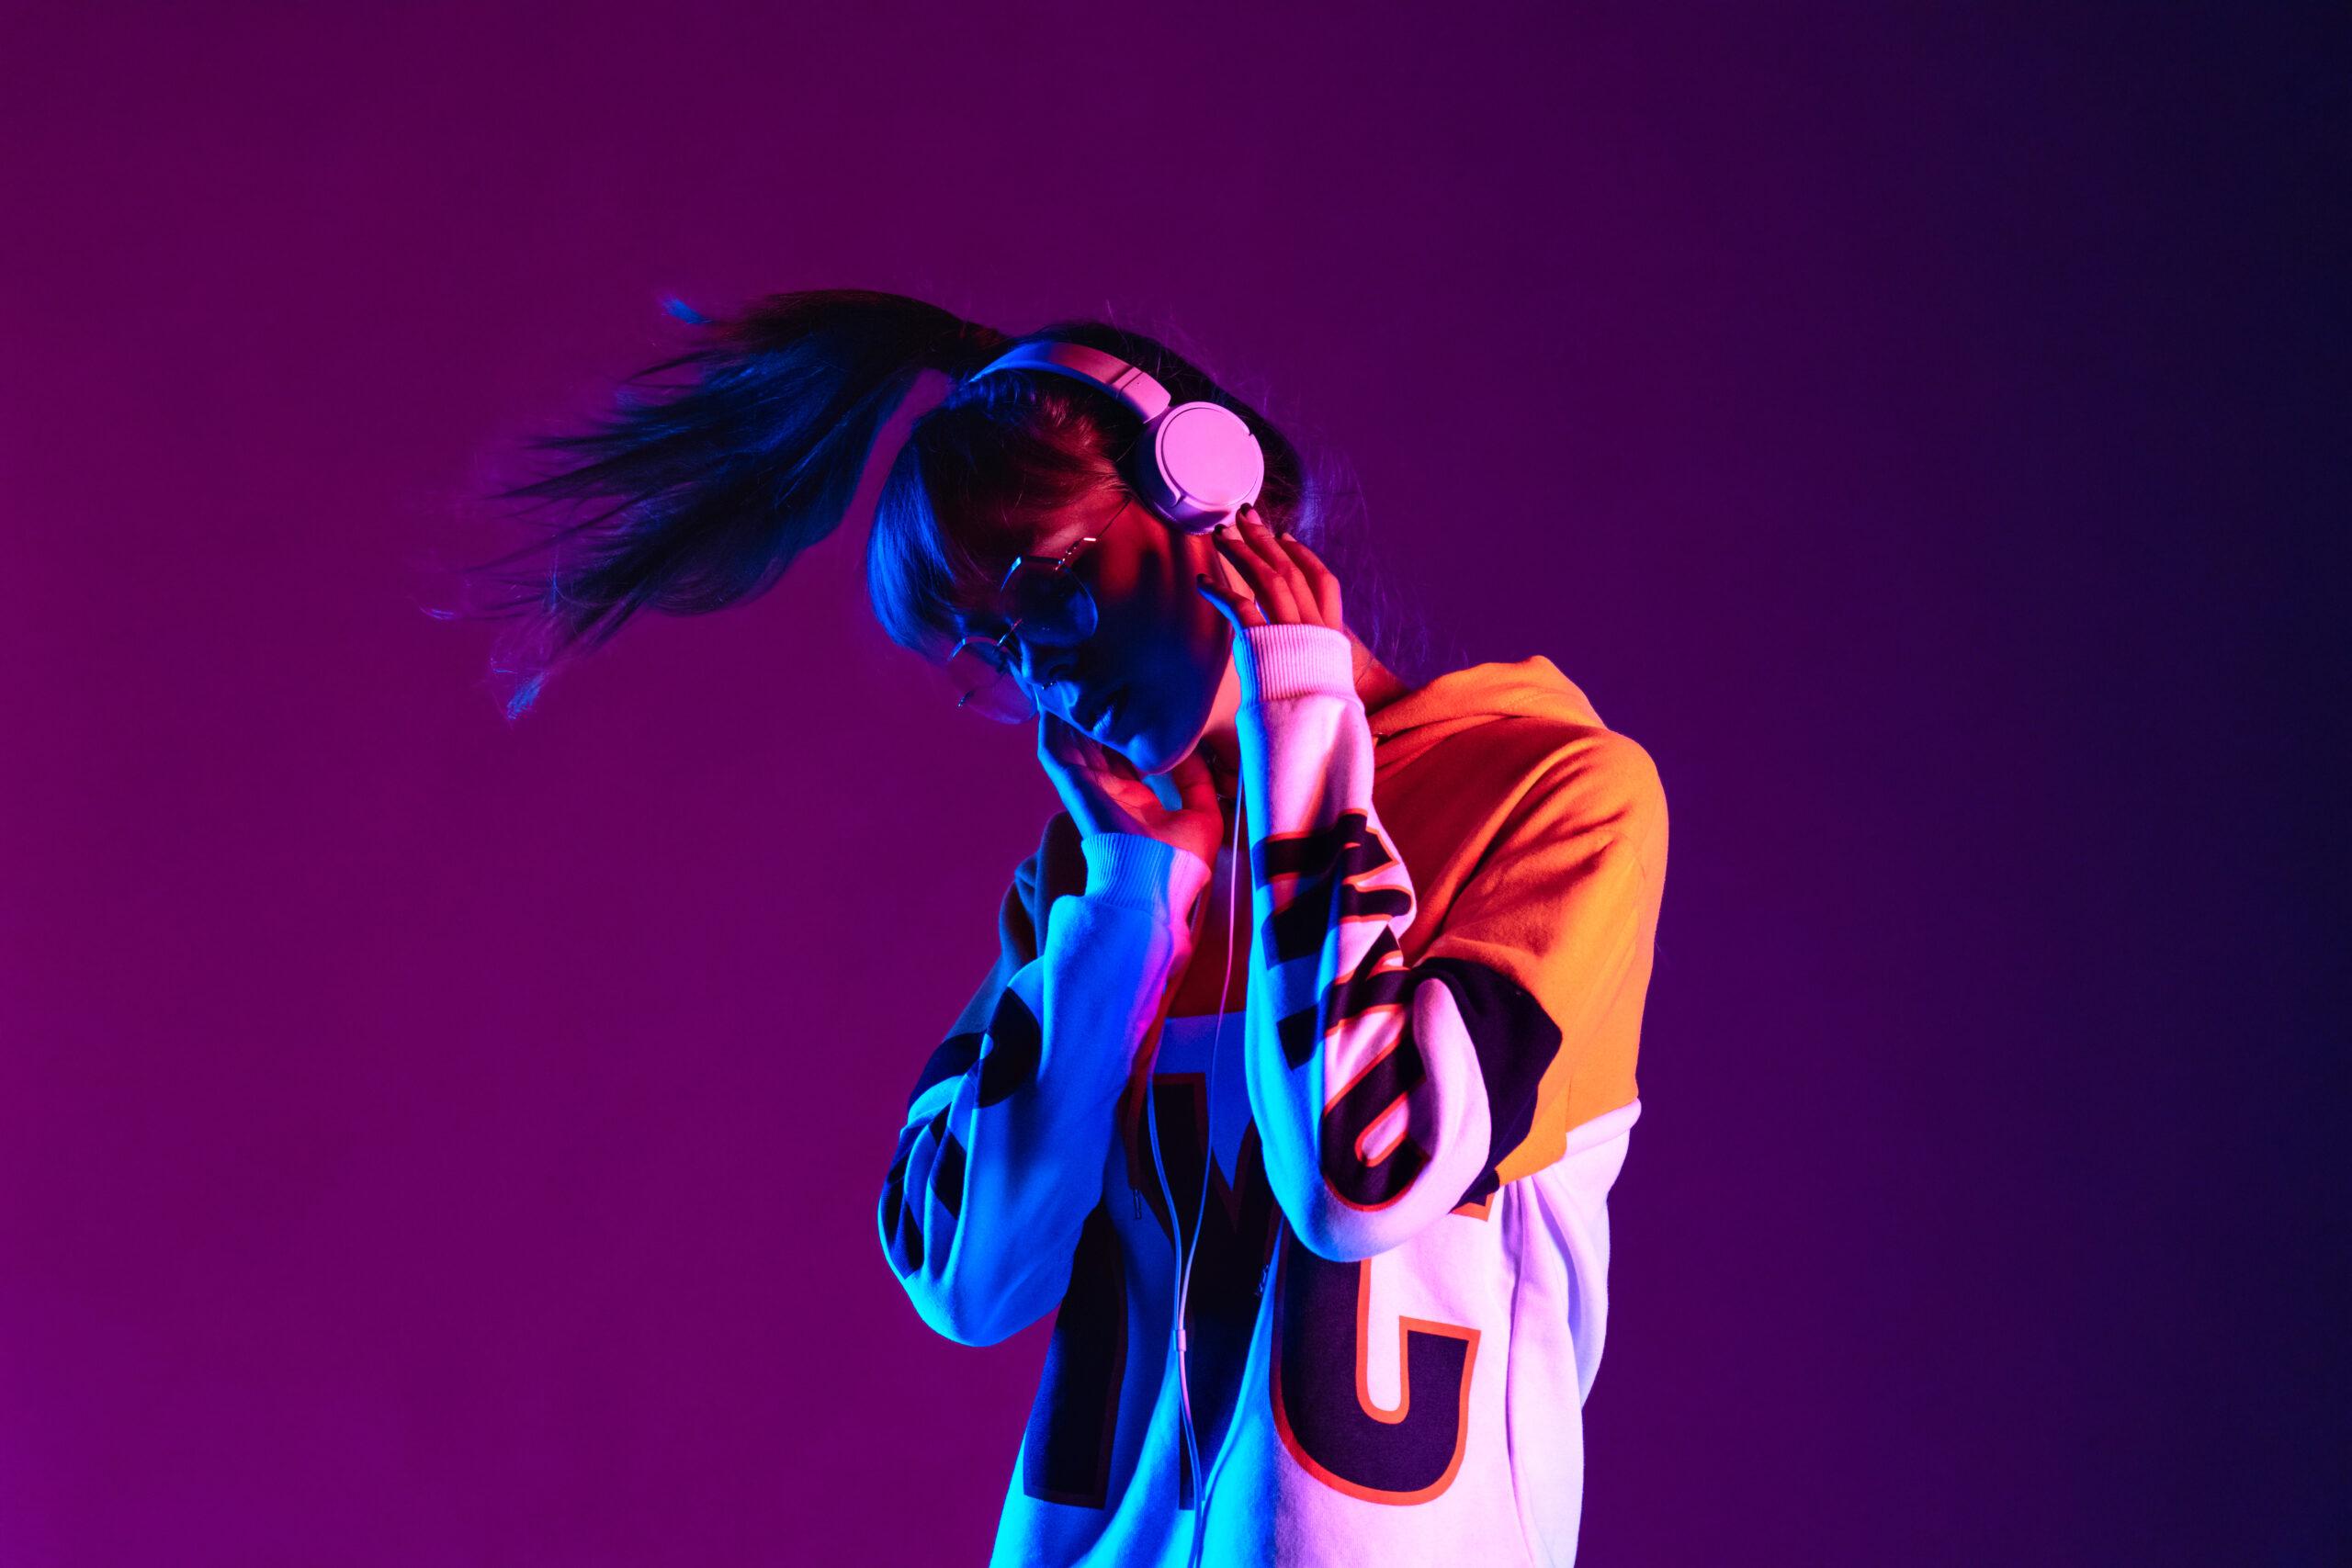 Stylish,fashion,teenager,model,wearing,hoodie,and,headphones,listening,dj